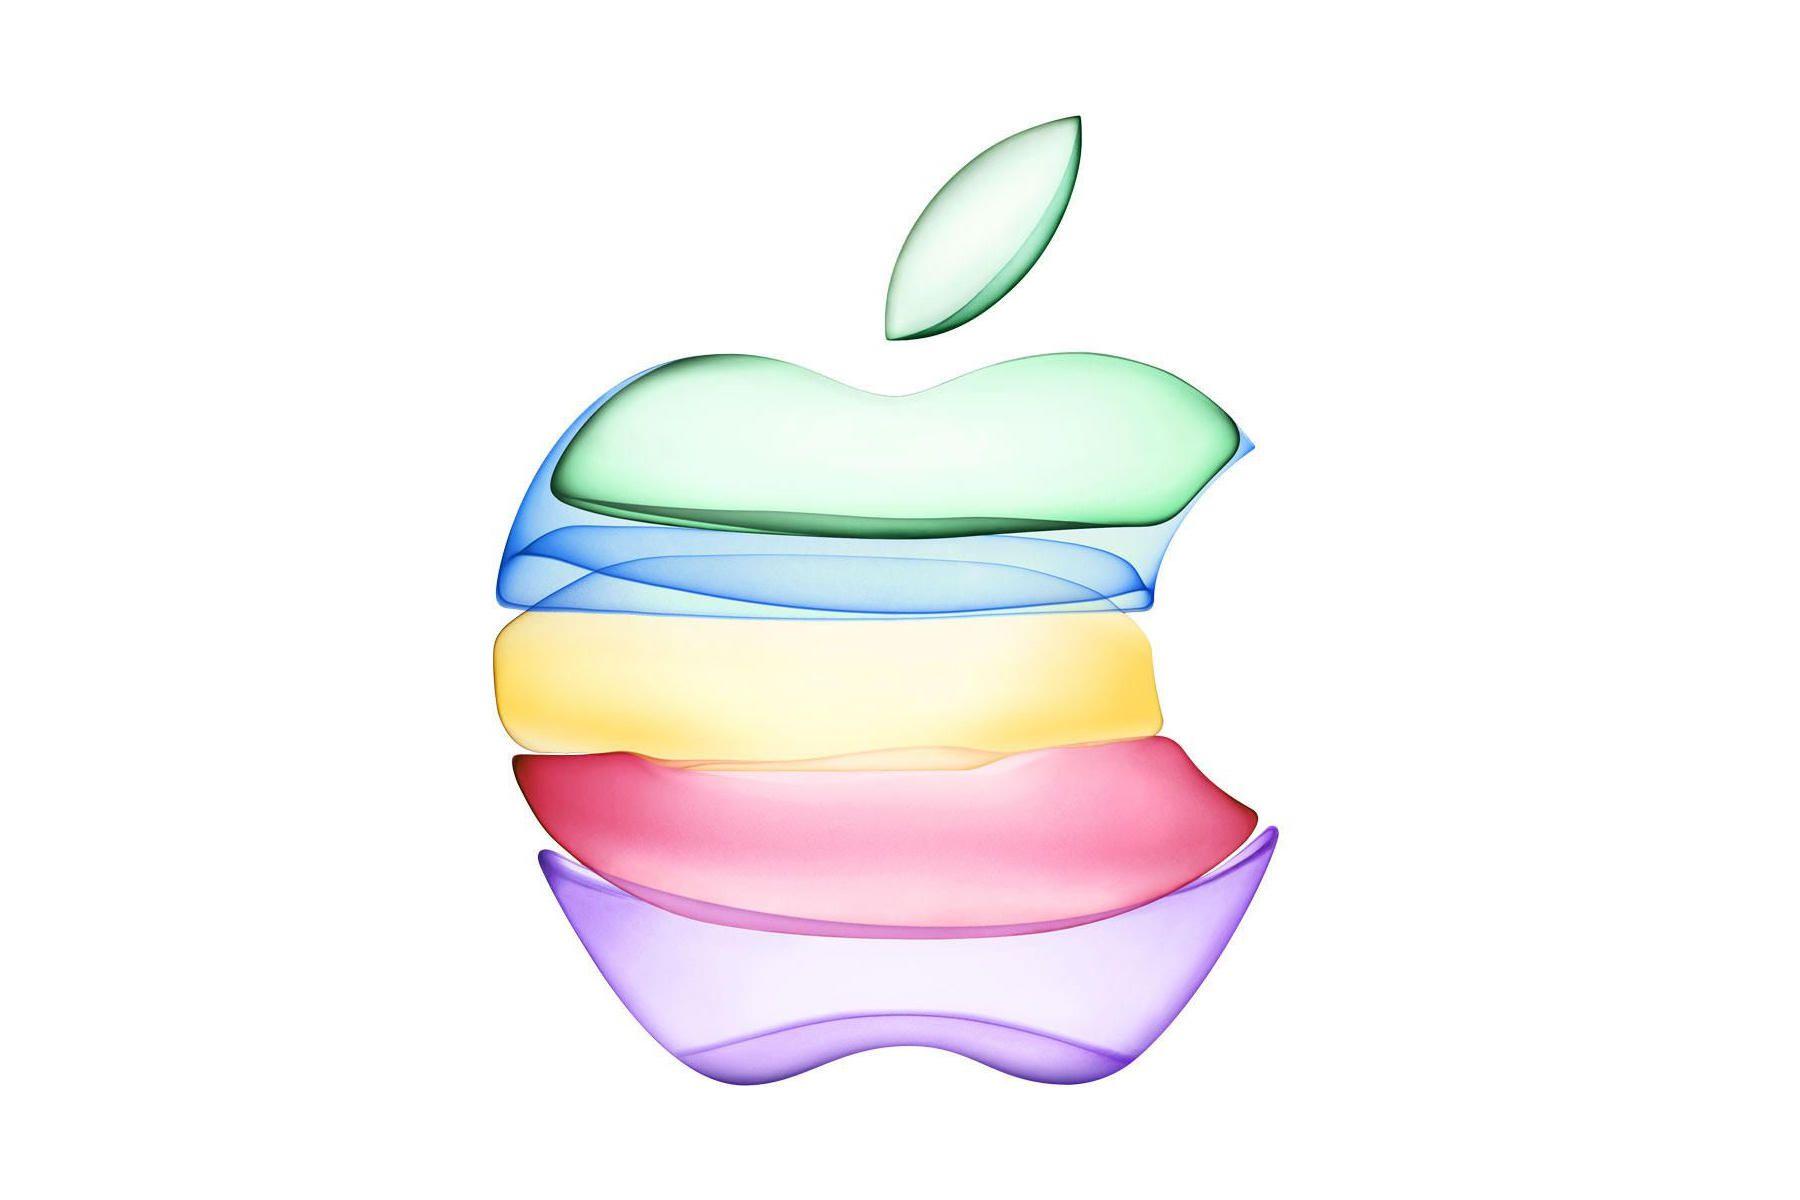 apple-iphone-11-invite.jpg